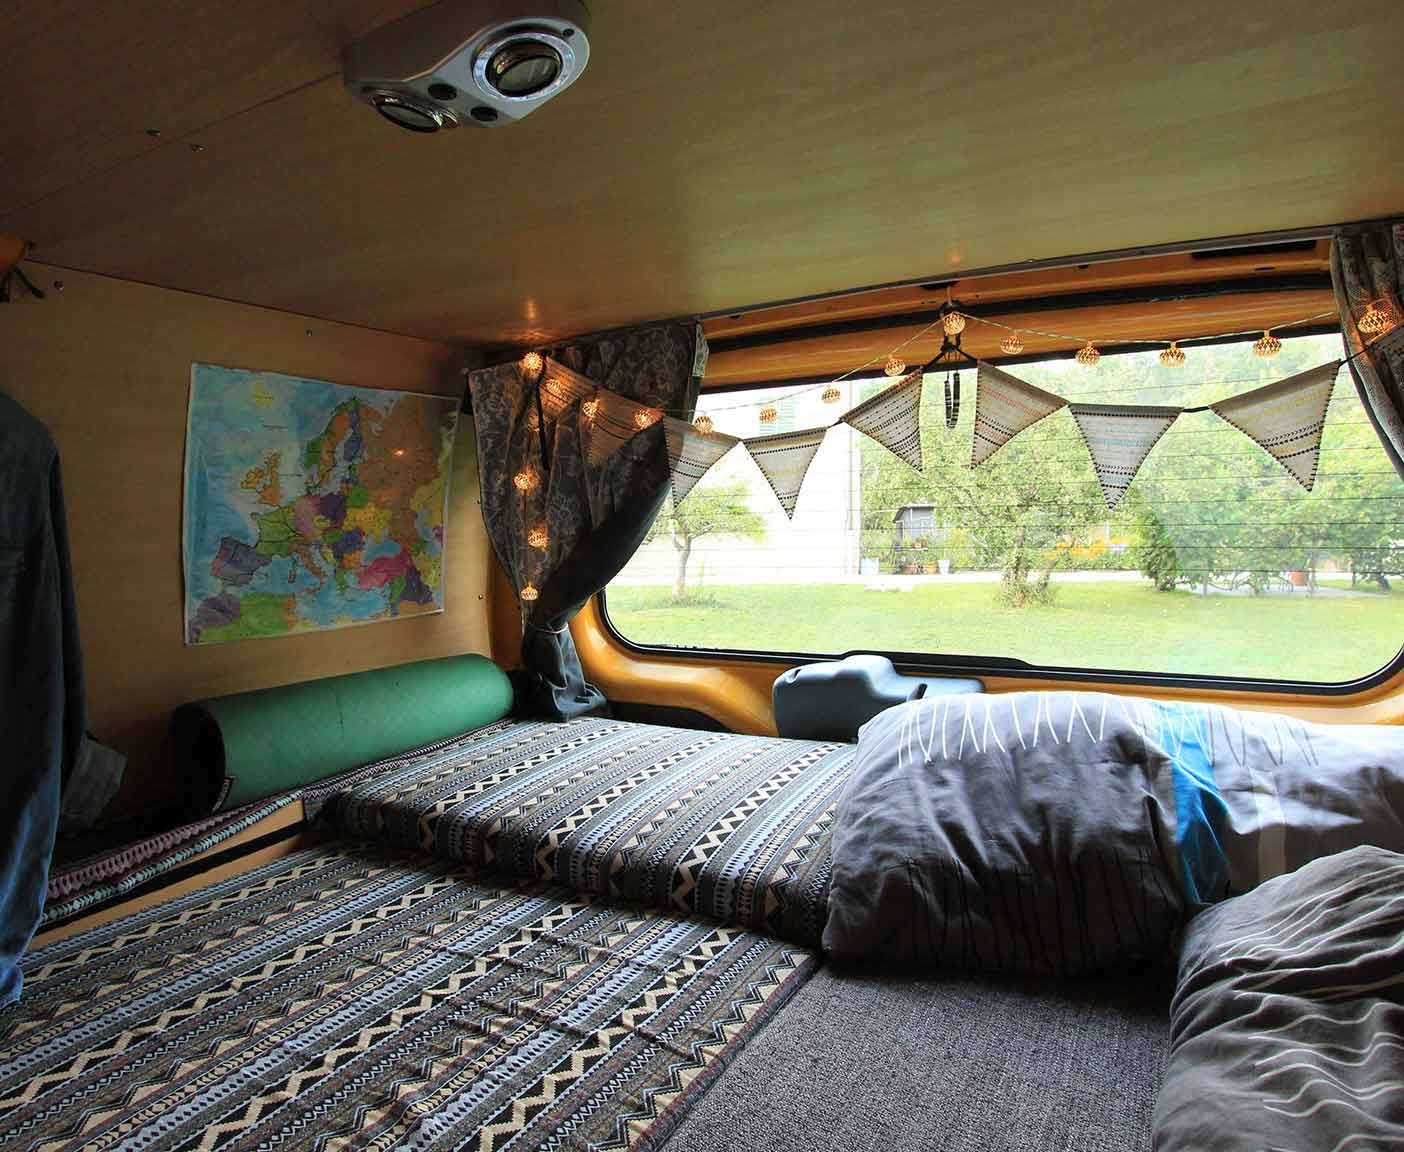 Ford-transit-kastenwagen-van-camper-vanlife-kombi-wiki